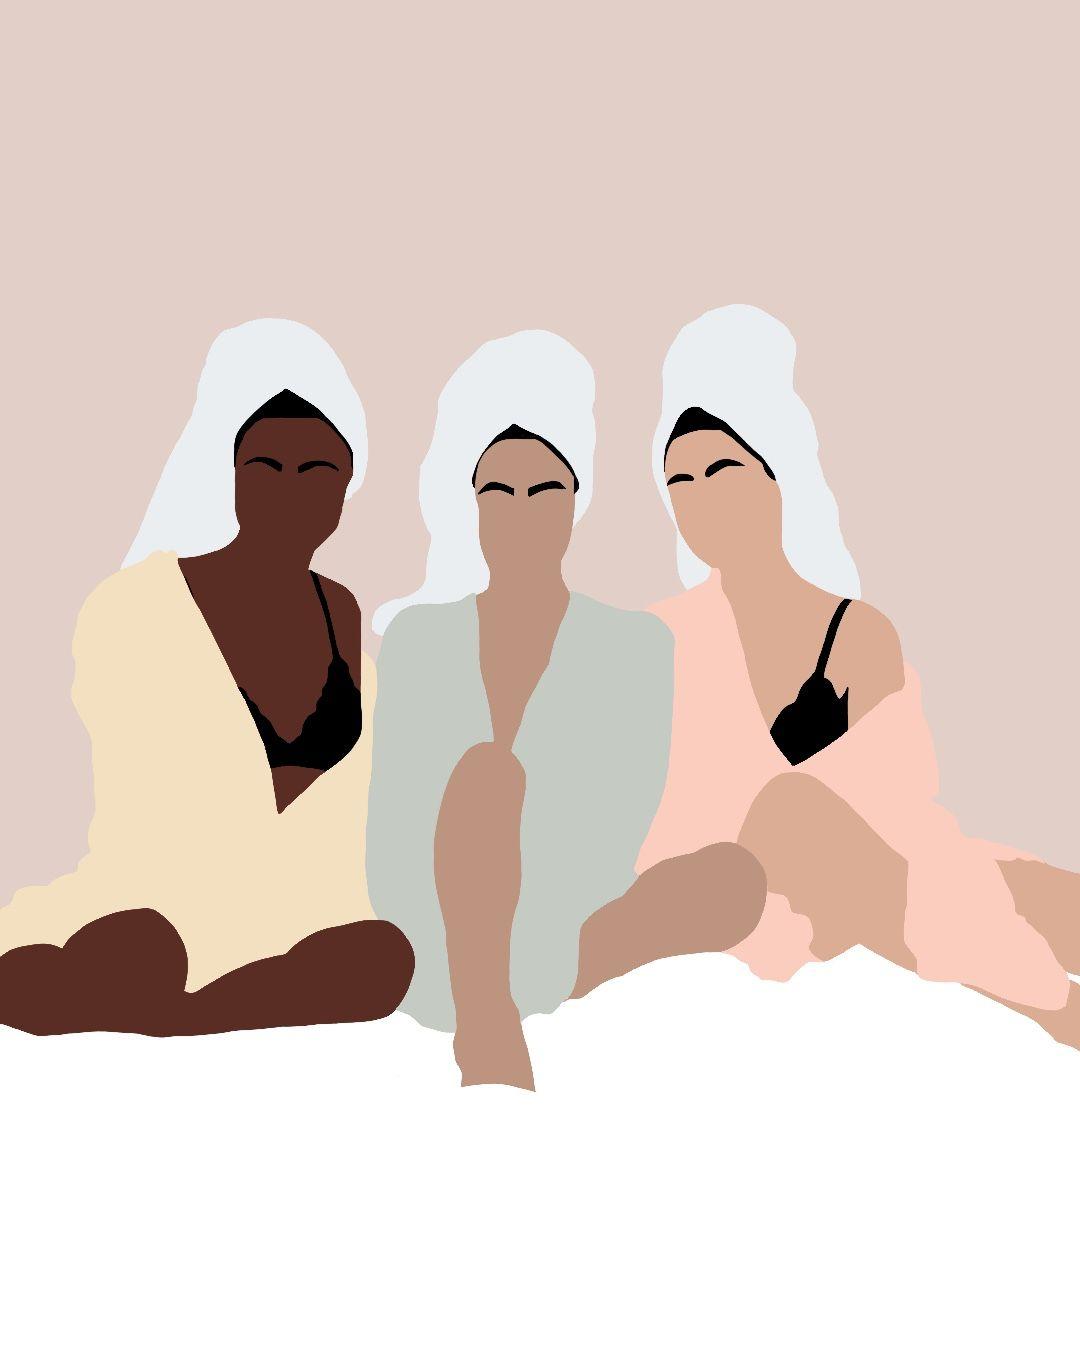 #procreate #girls #illustration #digitalart #girlboss